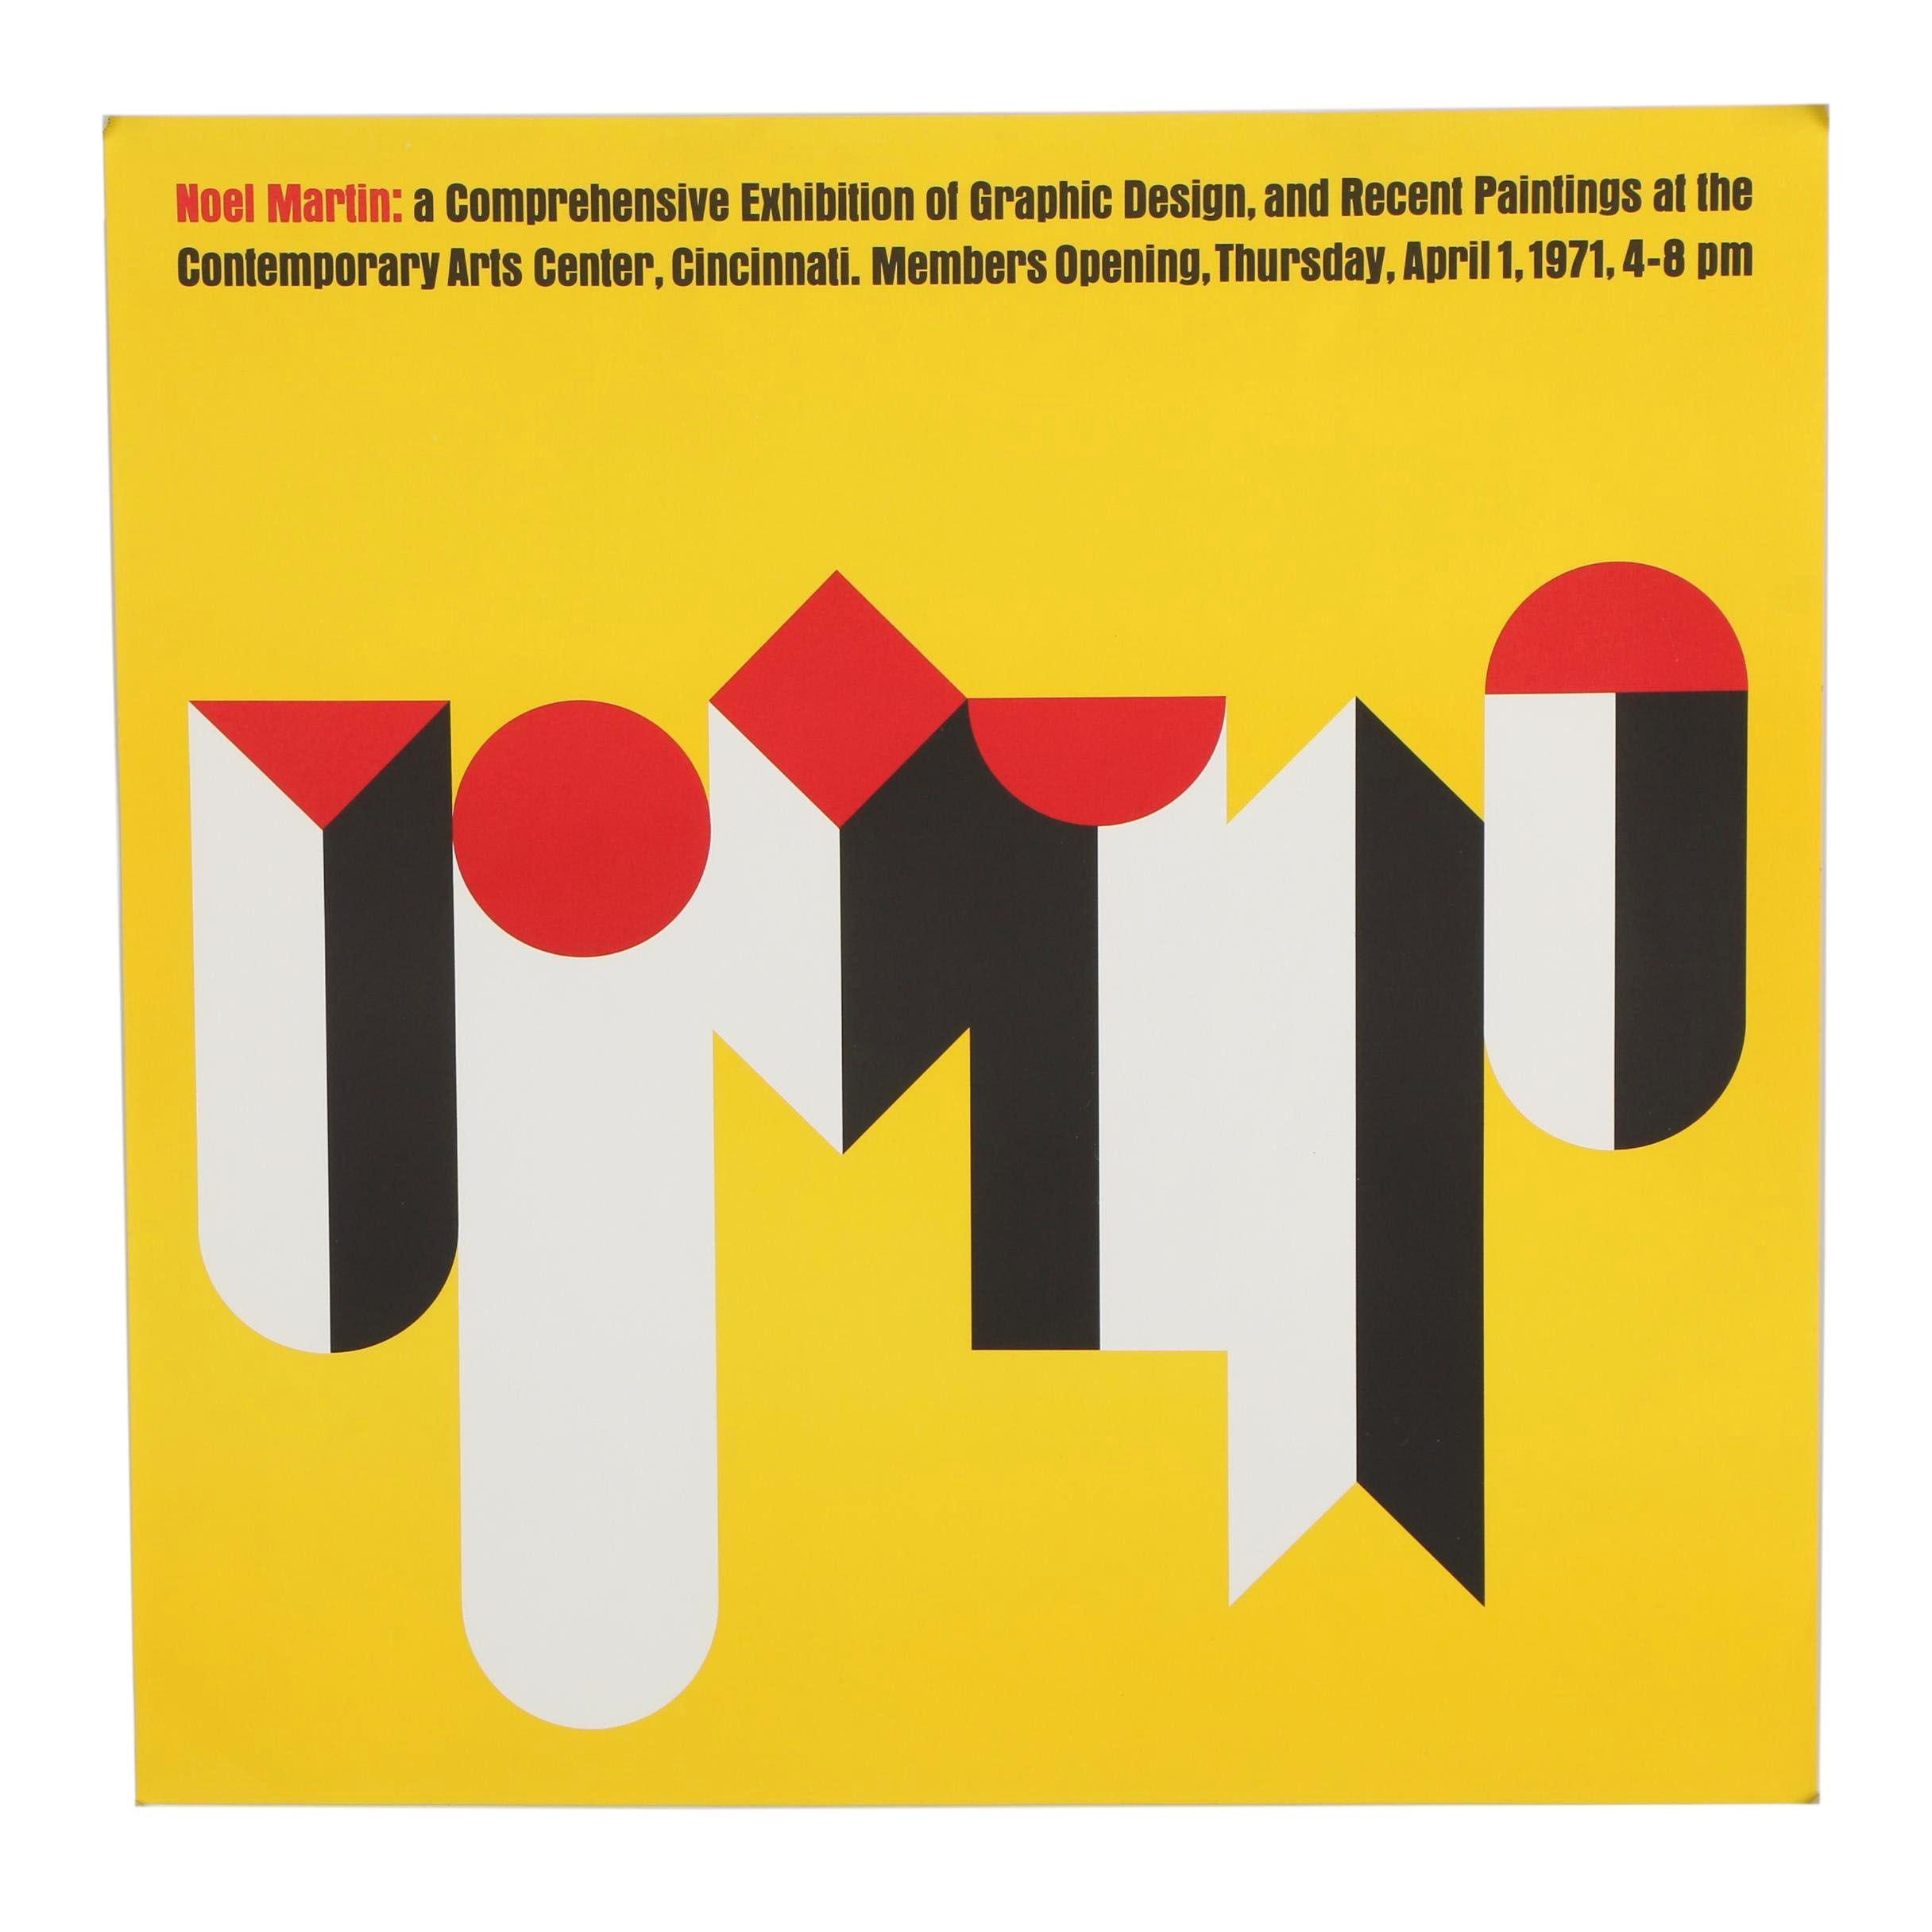 Contemporary Art Center Poster for the Noel Martin Exhibition